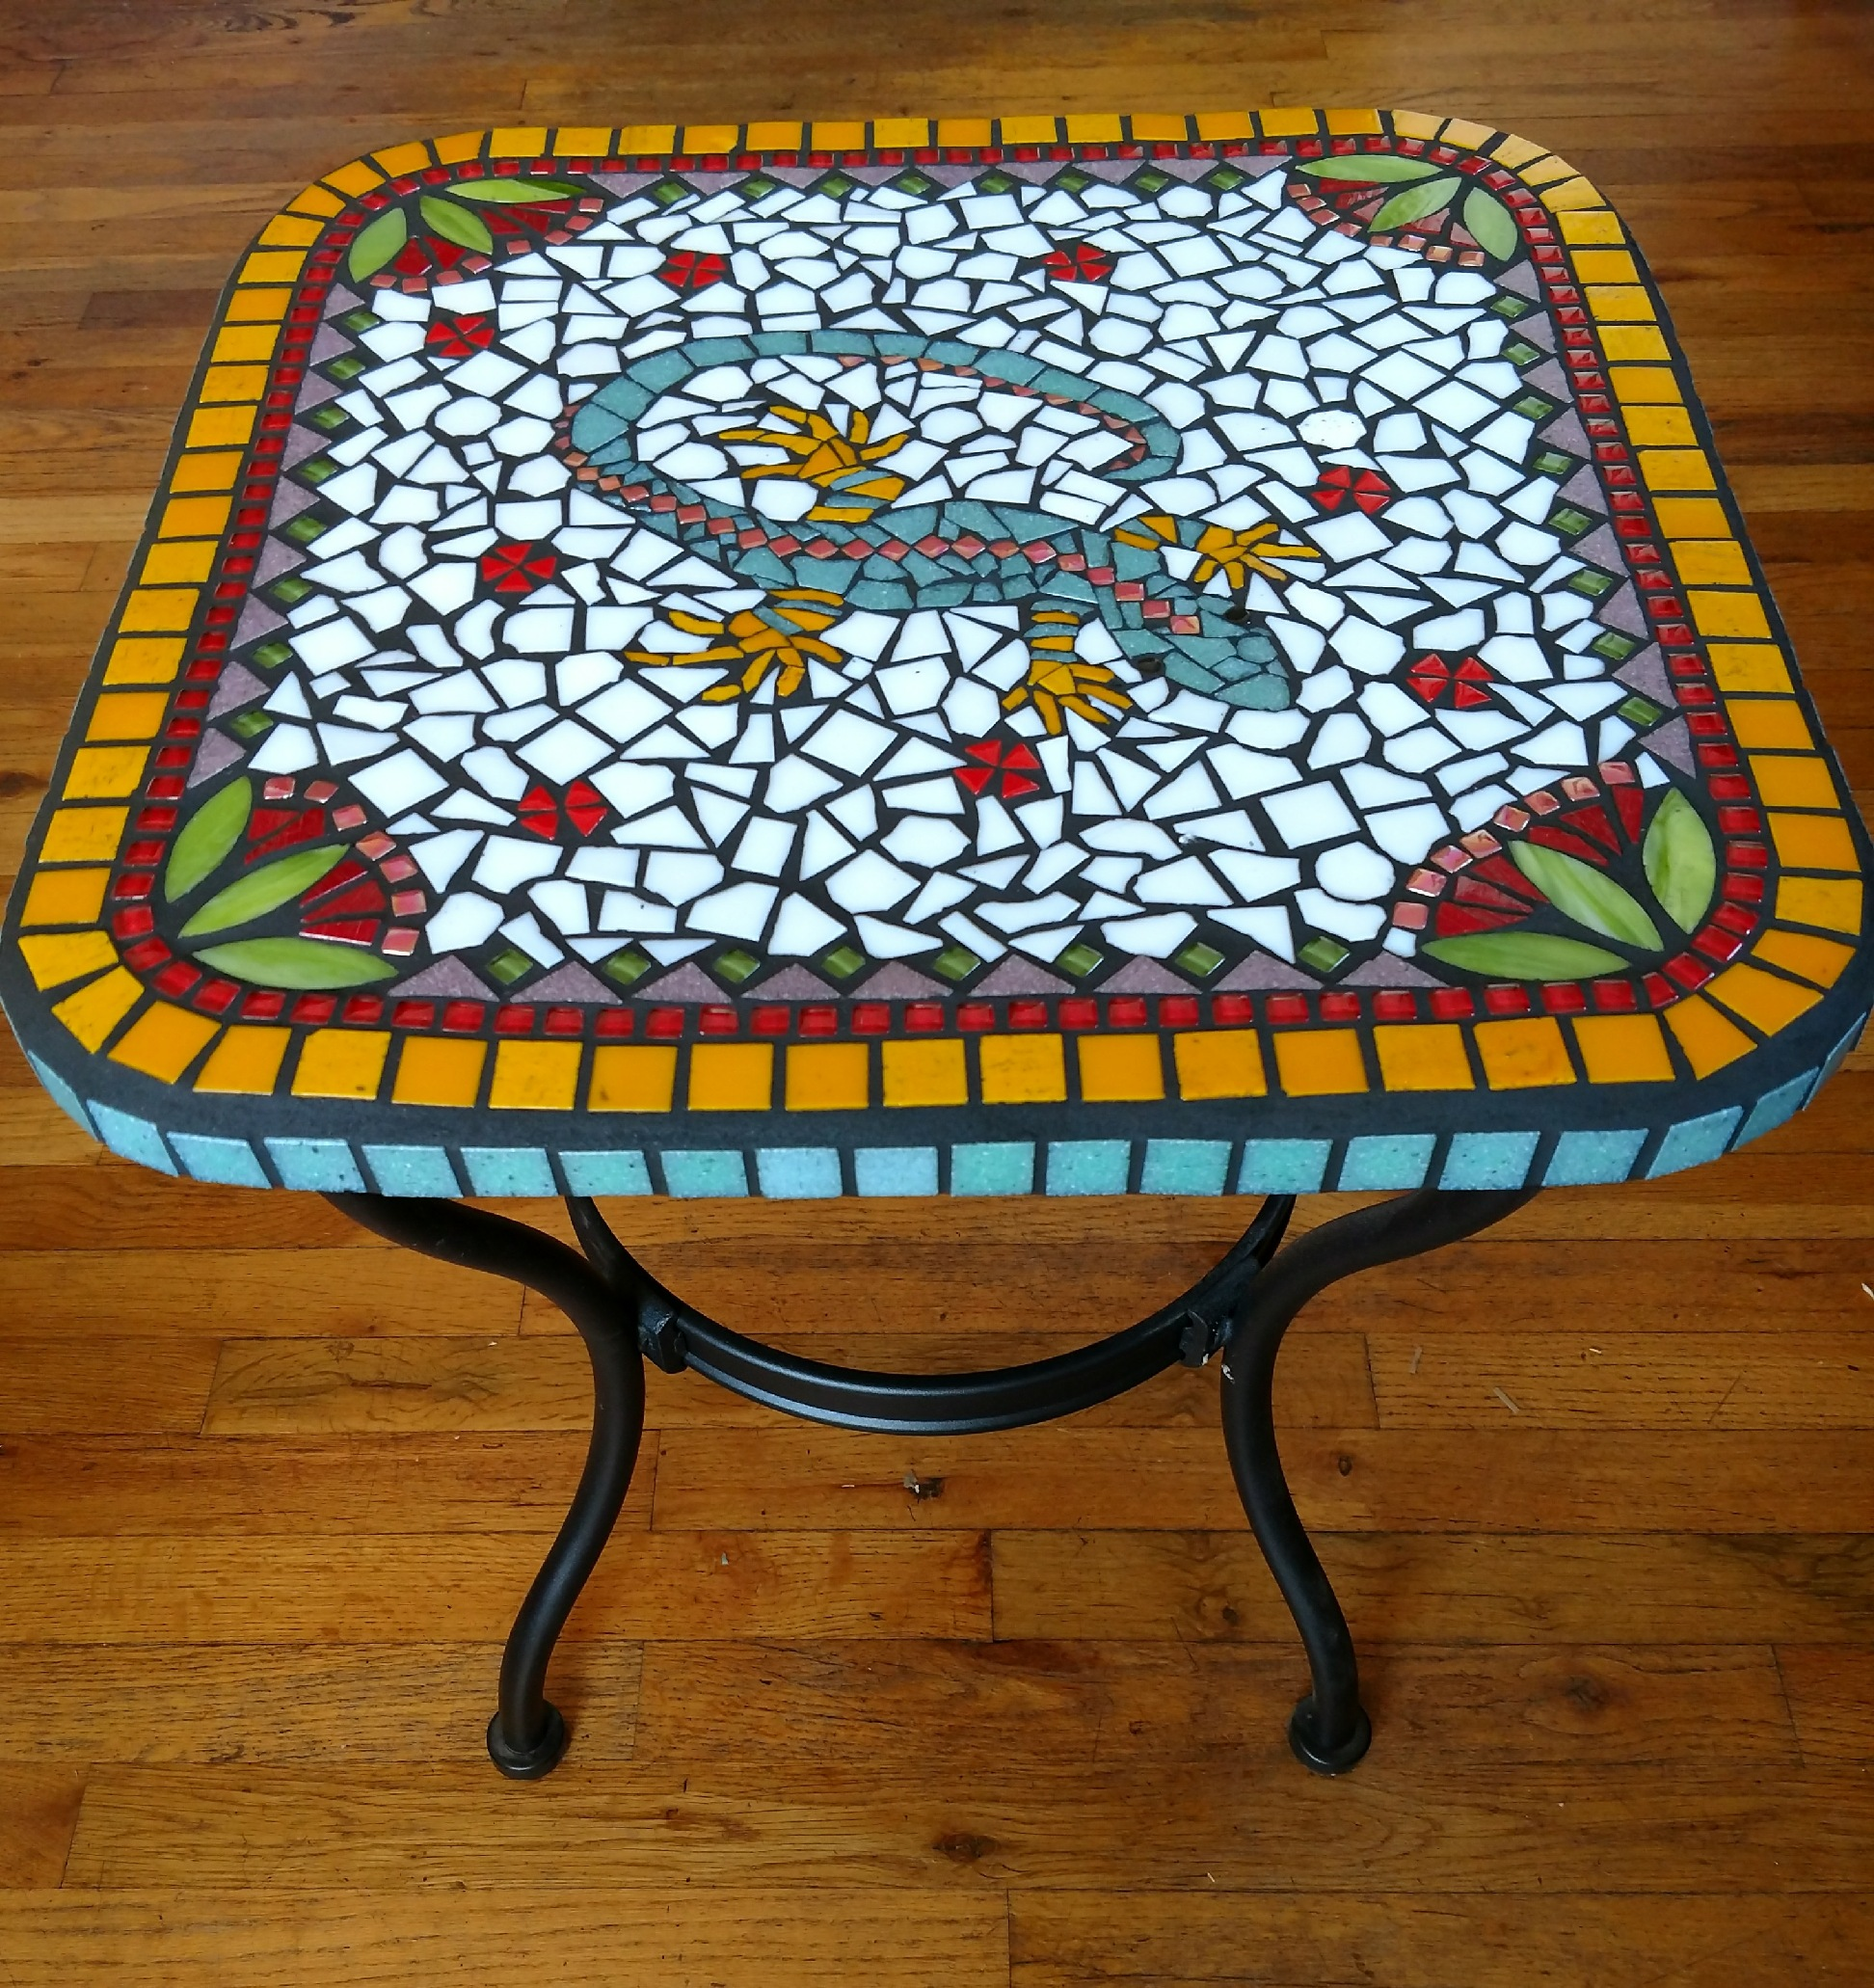 mosaic lizard table done.jpg